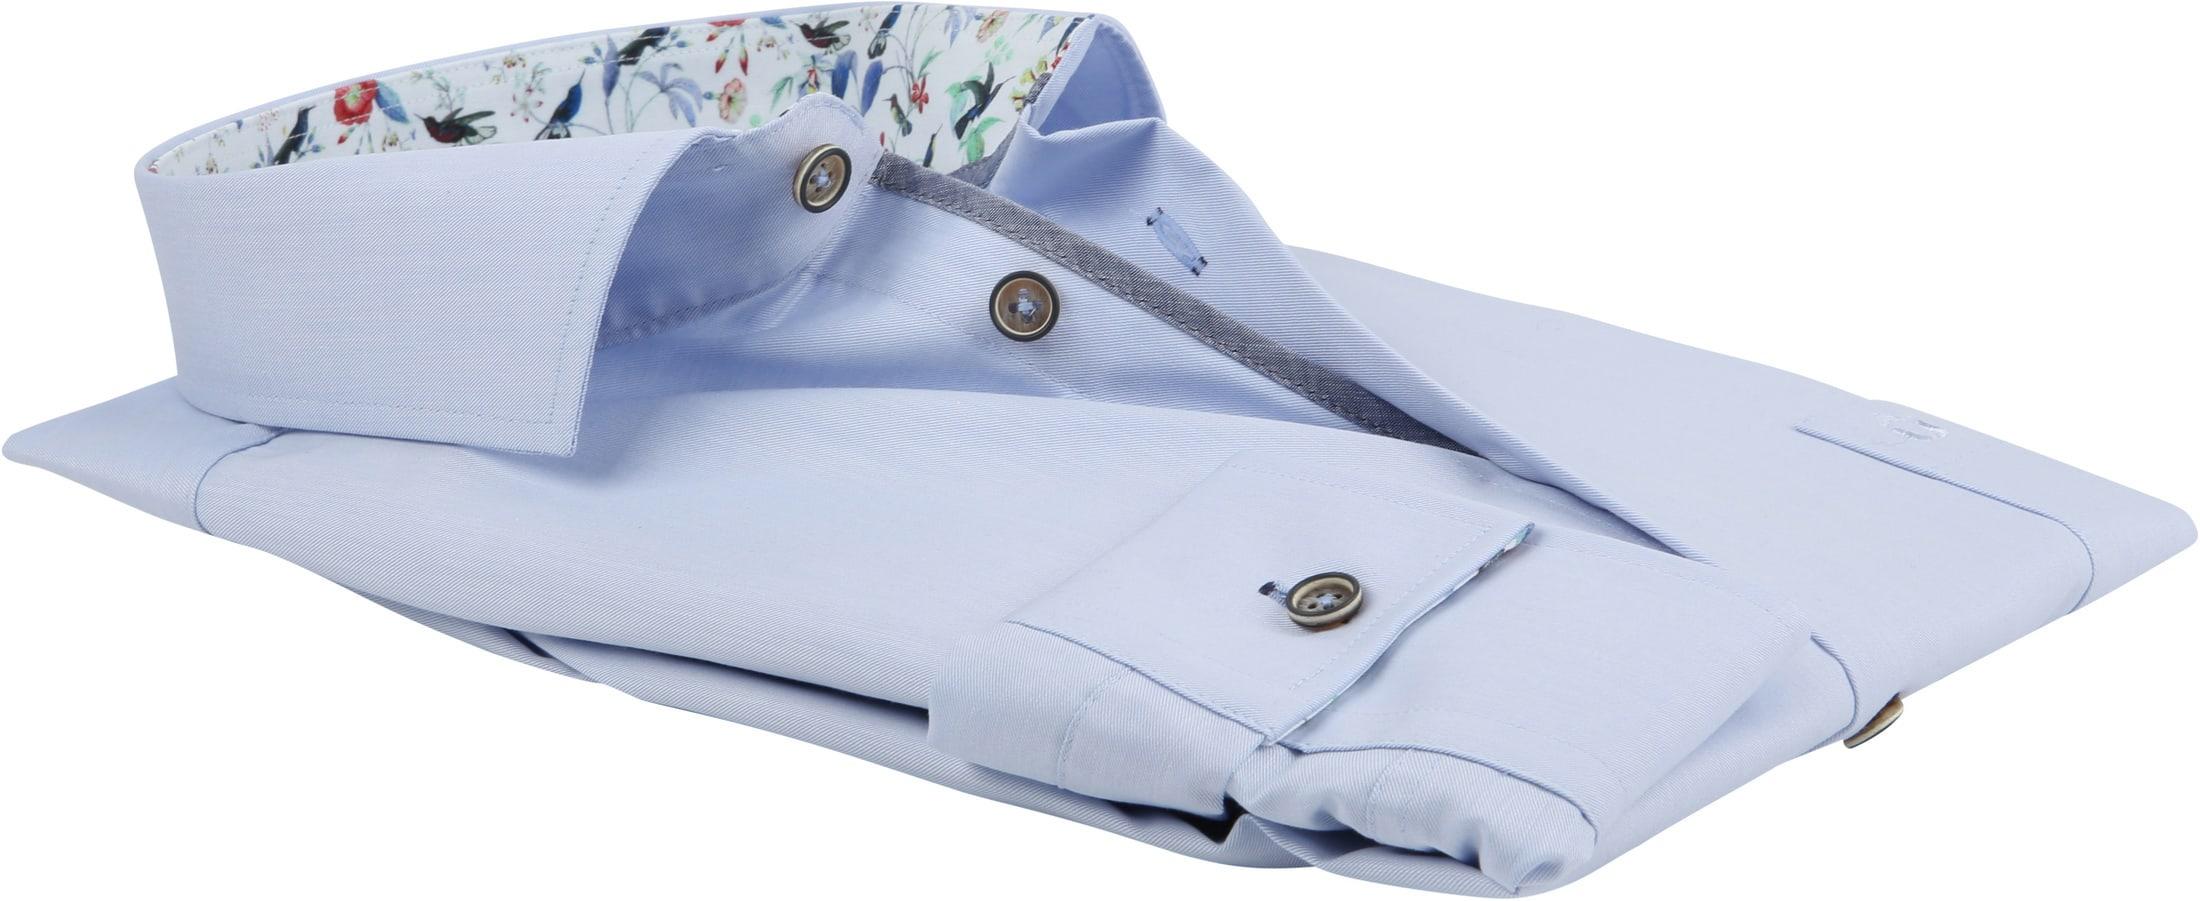 Ledub Overhemd Non Iron MF Blauw foto 3